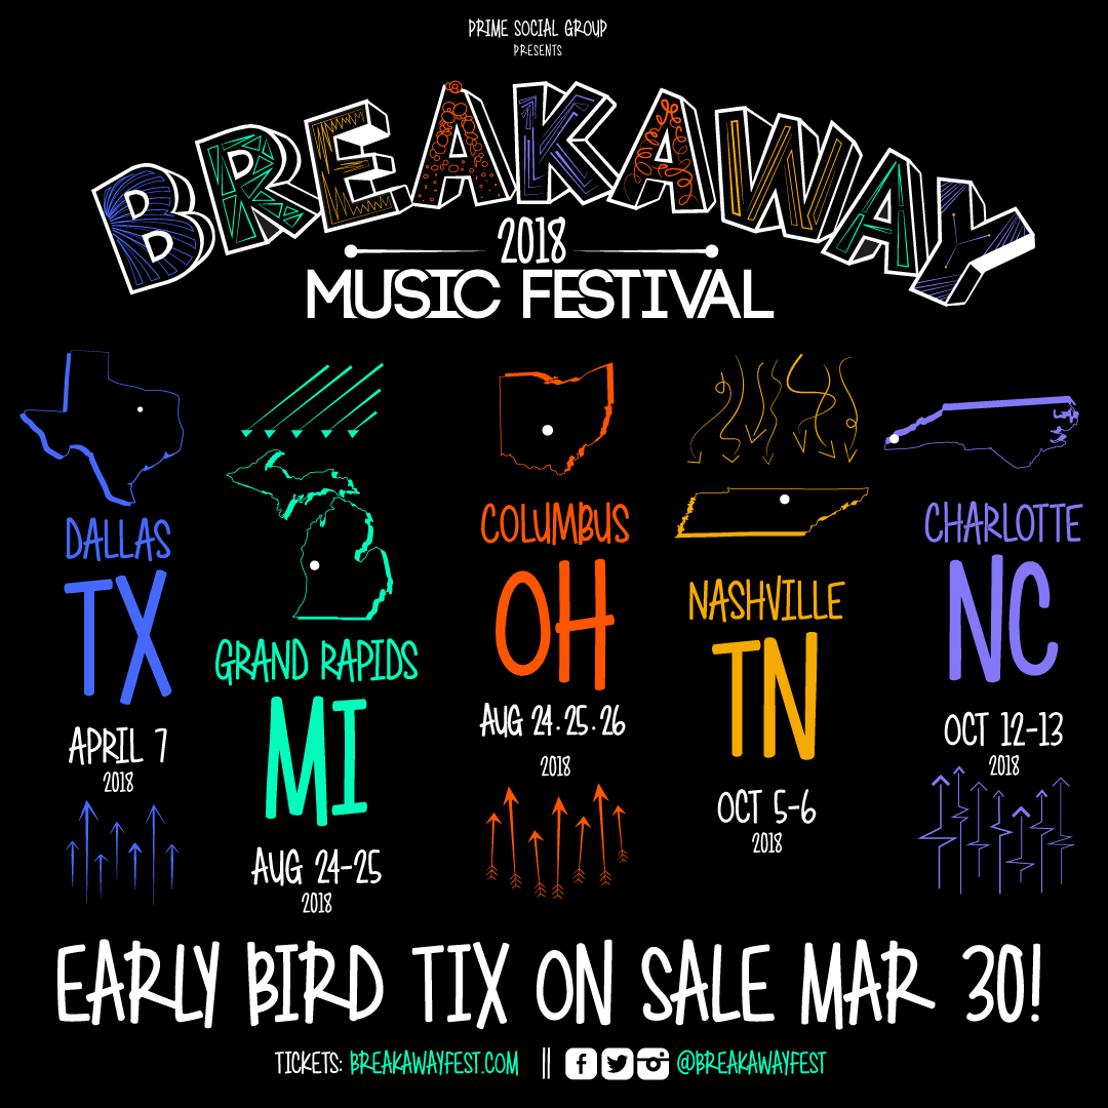 Prime Social Group Announces Complete 2018 Breakaway Music Festival Calendar, Including Nashville Expansion